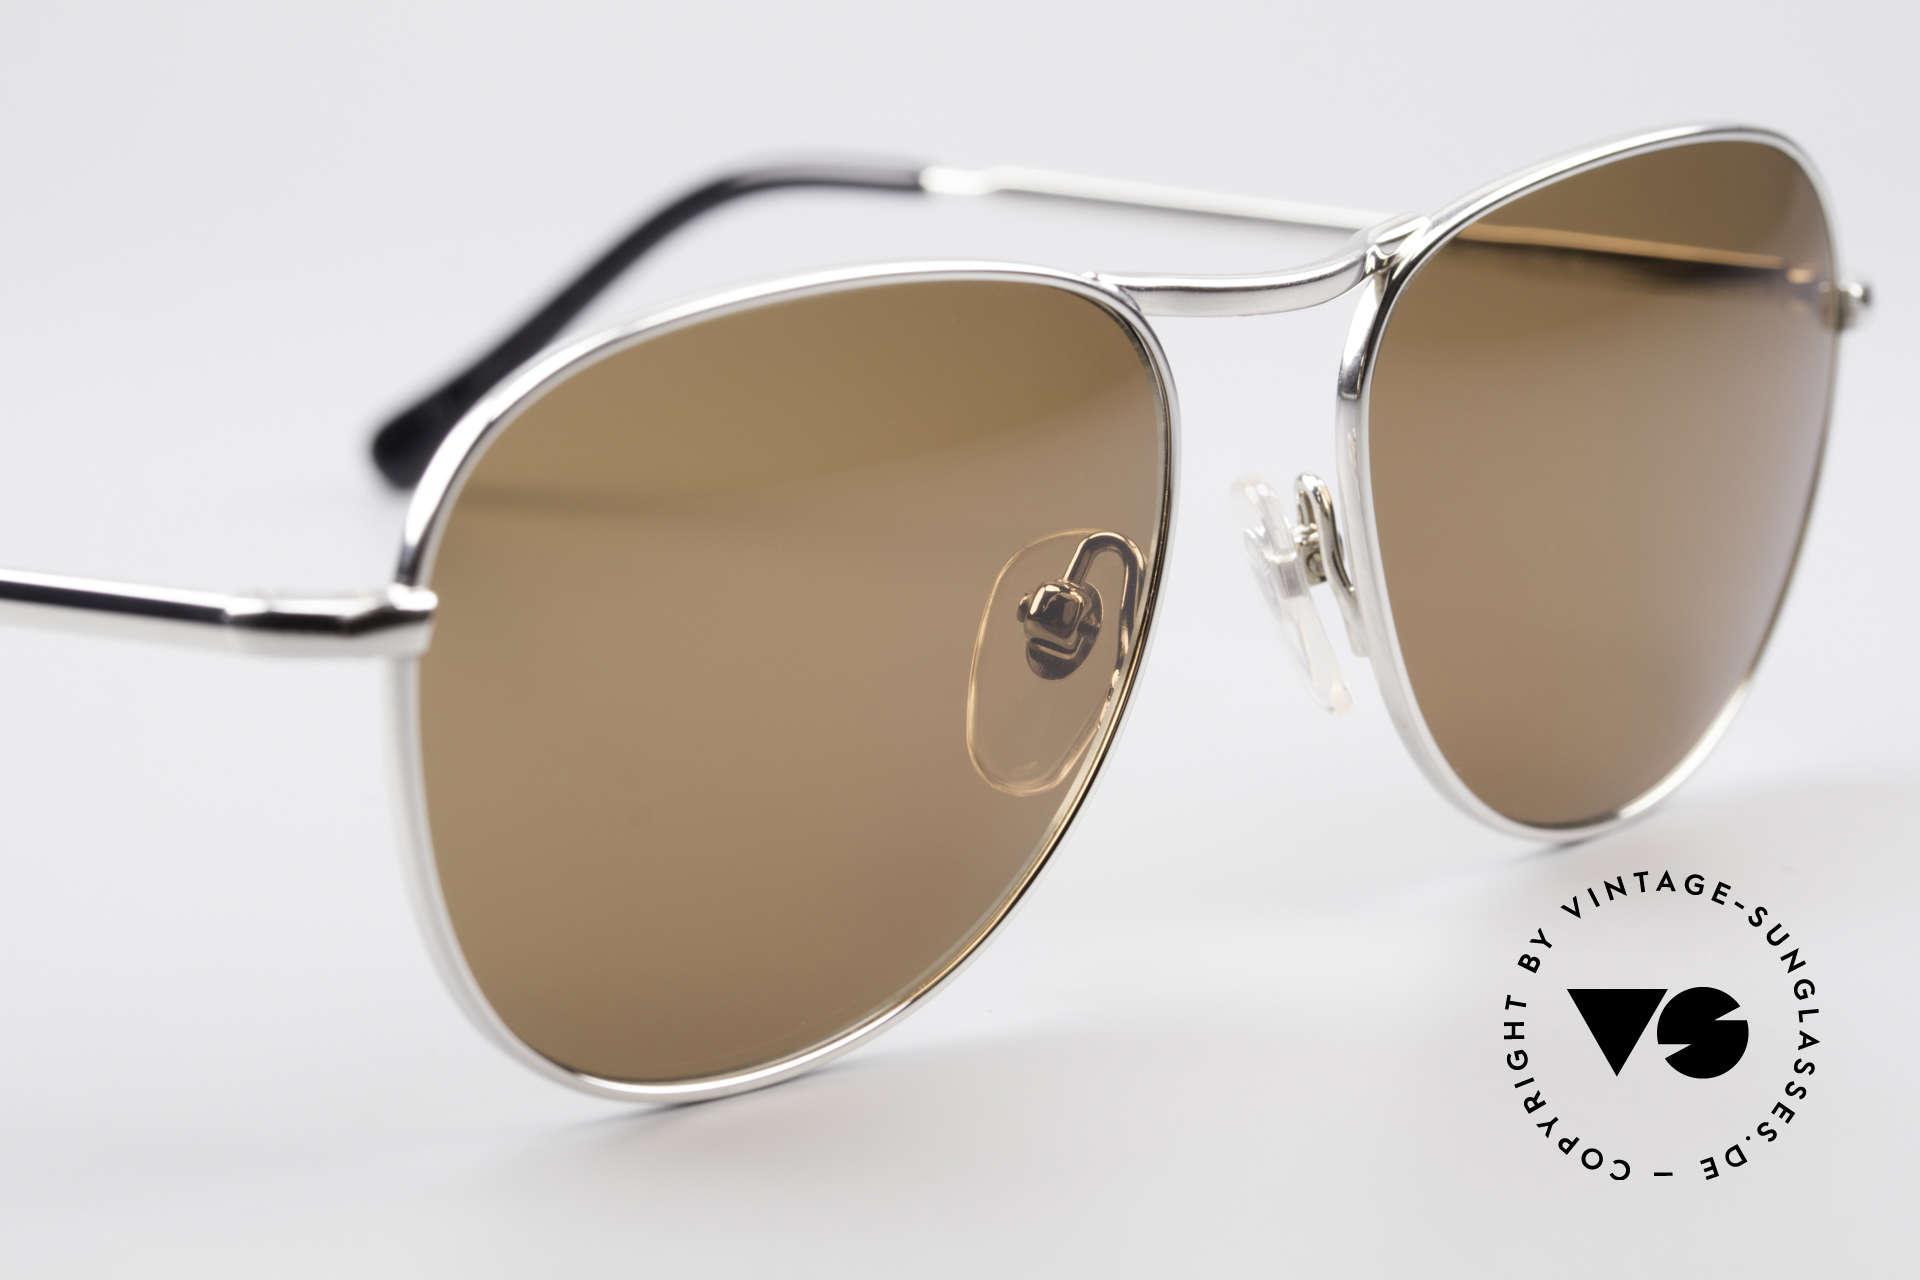 Helmut Lang 21-0006 Titanium Sunglasses Timeless, never worn (like all our vintage HELMUT LANG shades), Made for Men